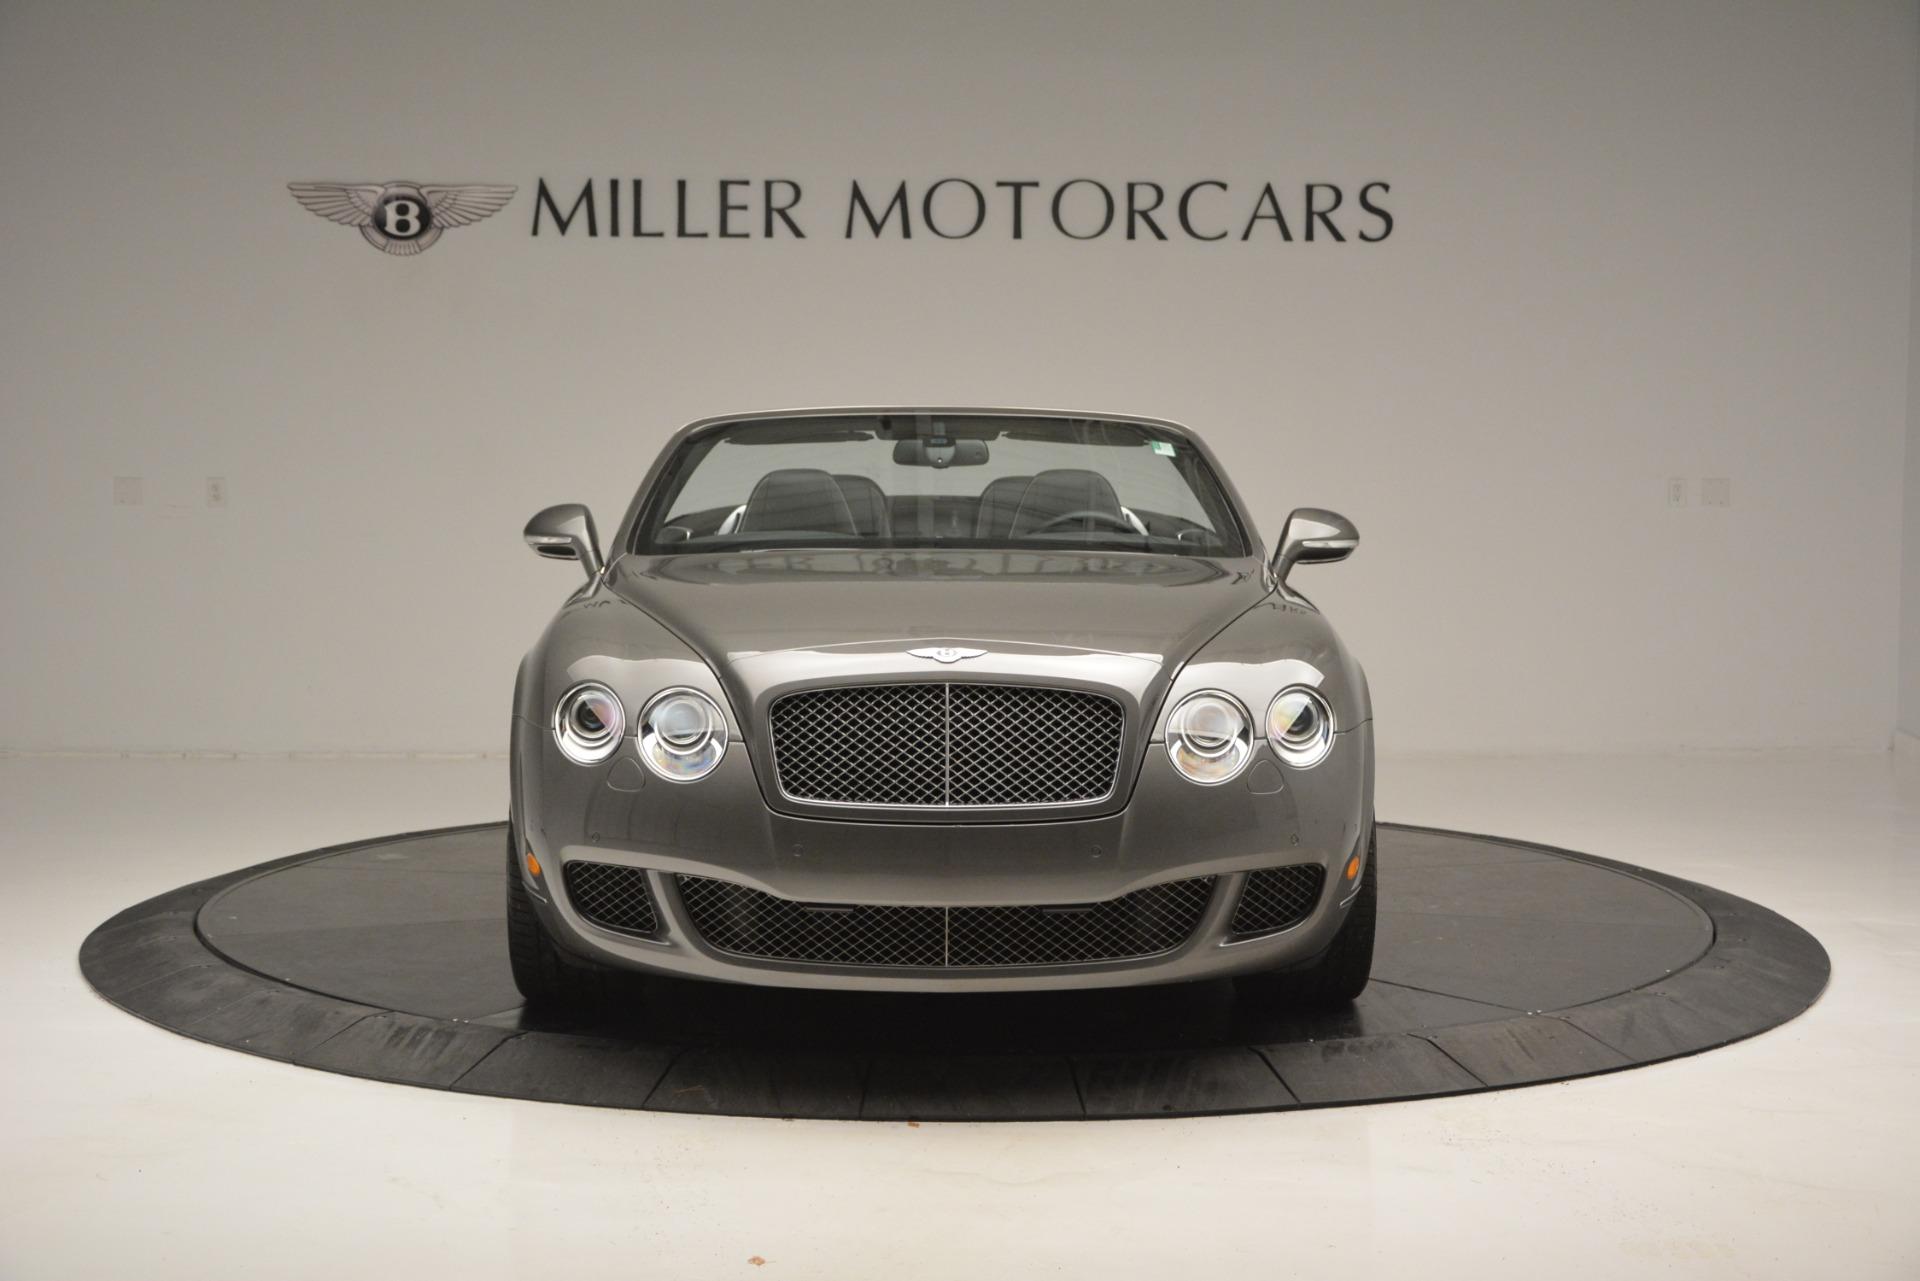 Used 2010 Bentley Continental GT Speed For Sale In Westport, CT 2677_p10